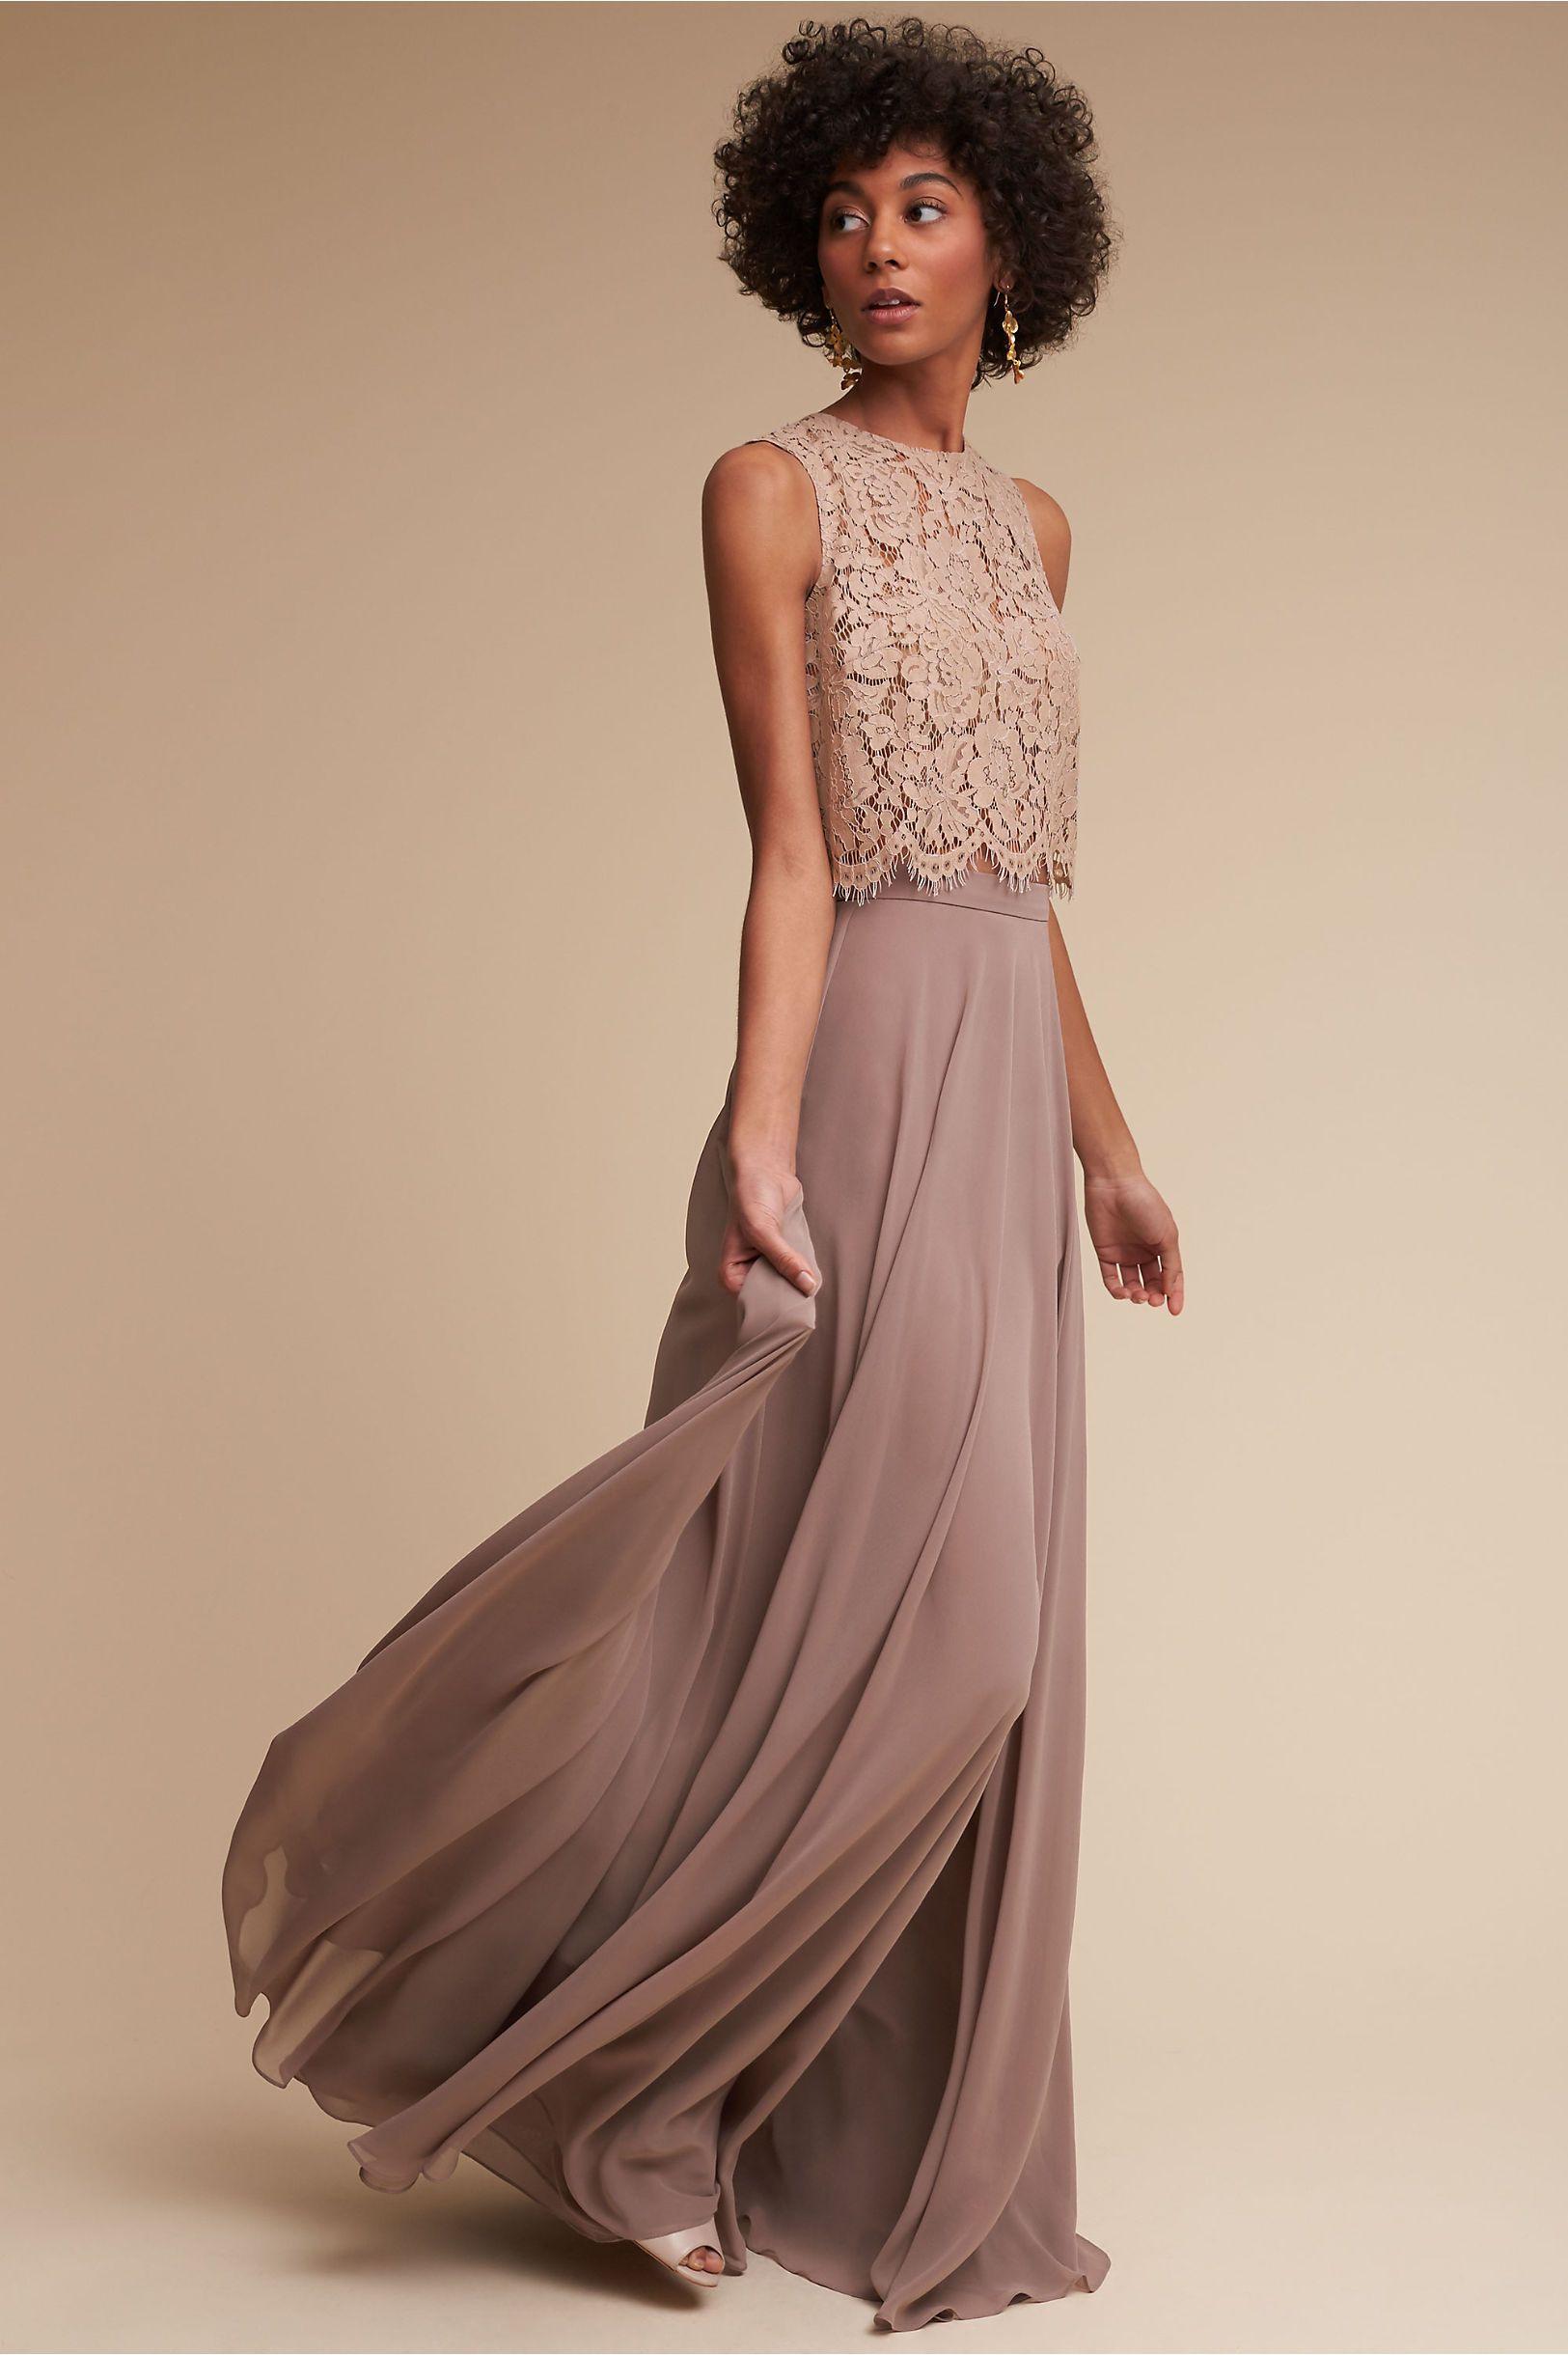 Bhldn Cleo Top & Hampton Skirt In Bridal Party | Bhldn